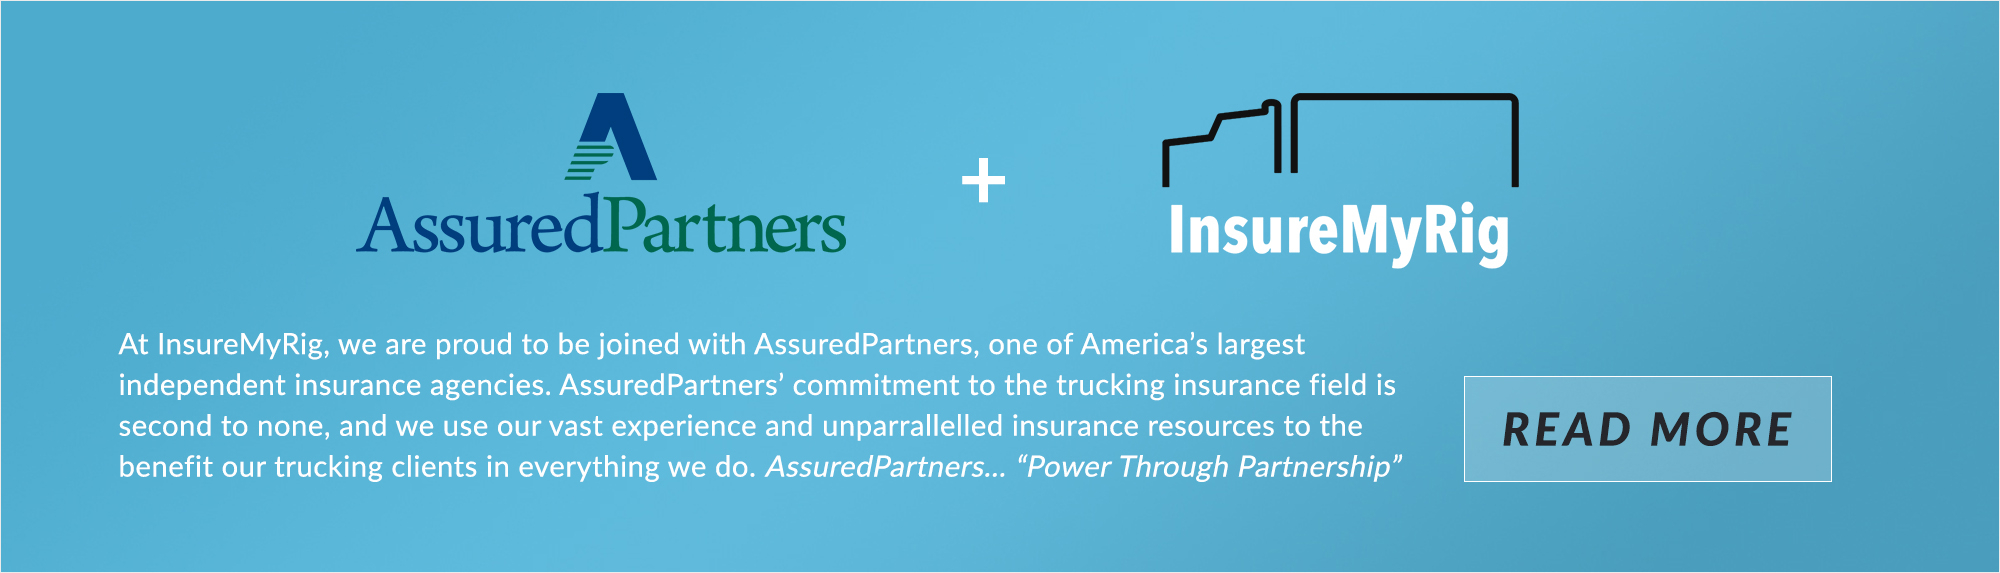 Assured Partners